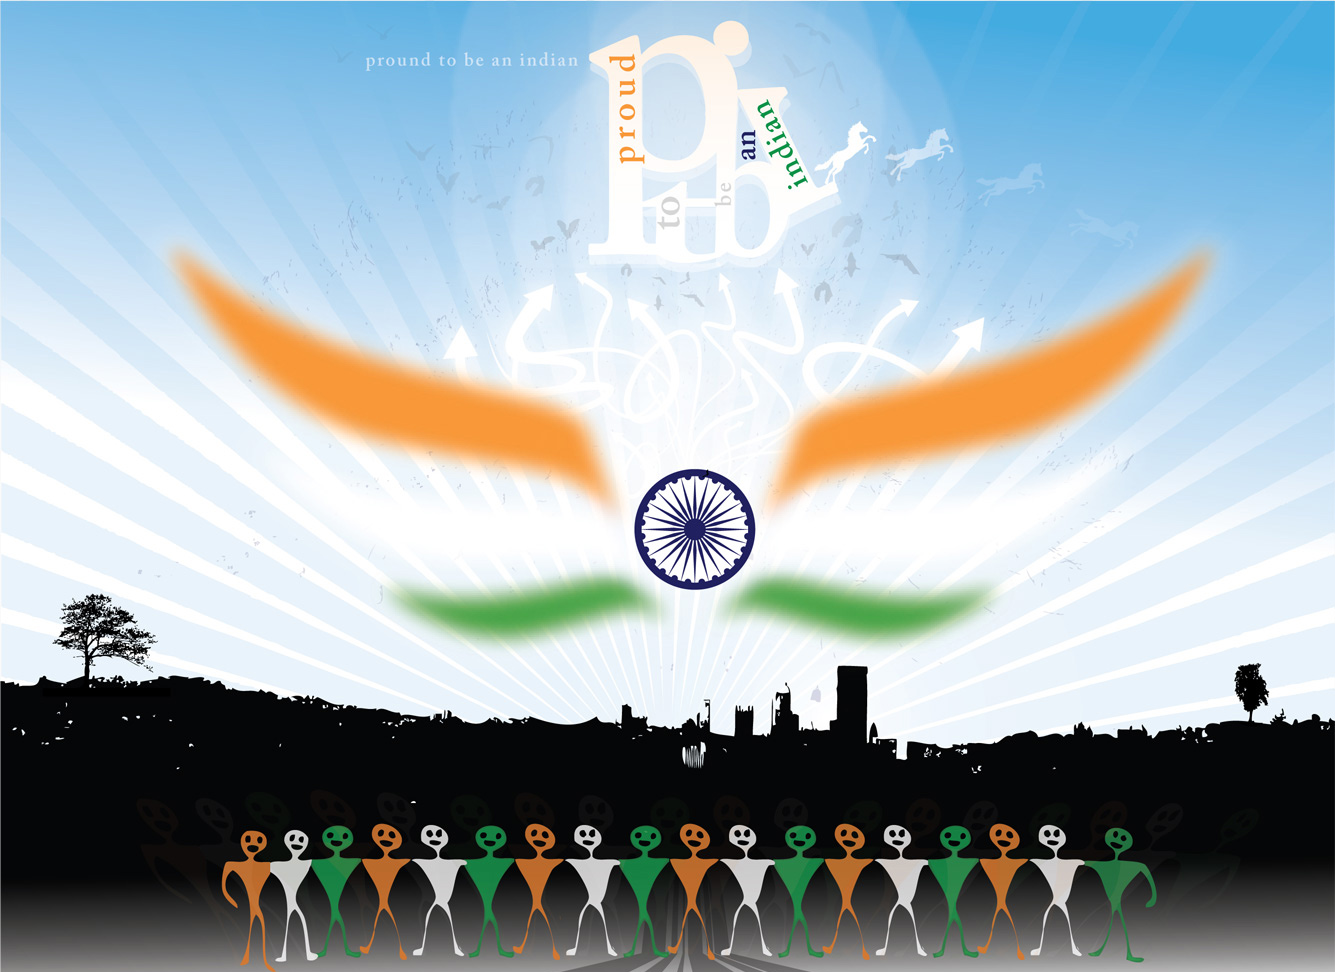 Incredible India Wallpapers Proud to be Indian Vande Mataram 1335x972